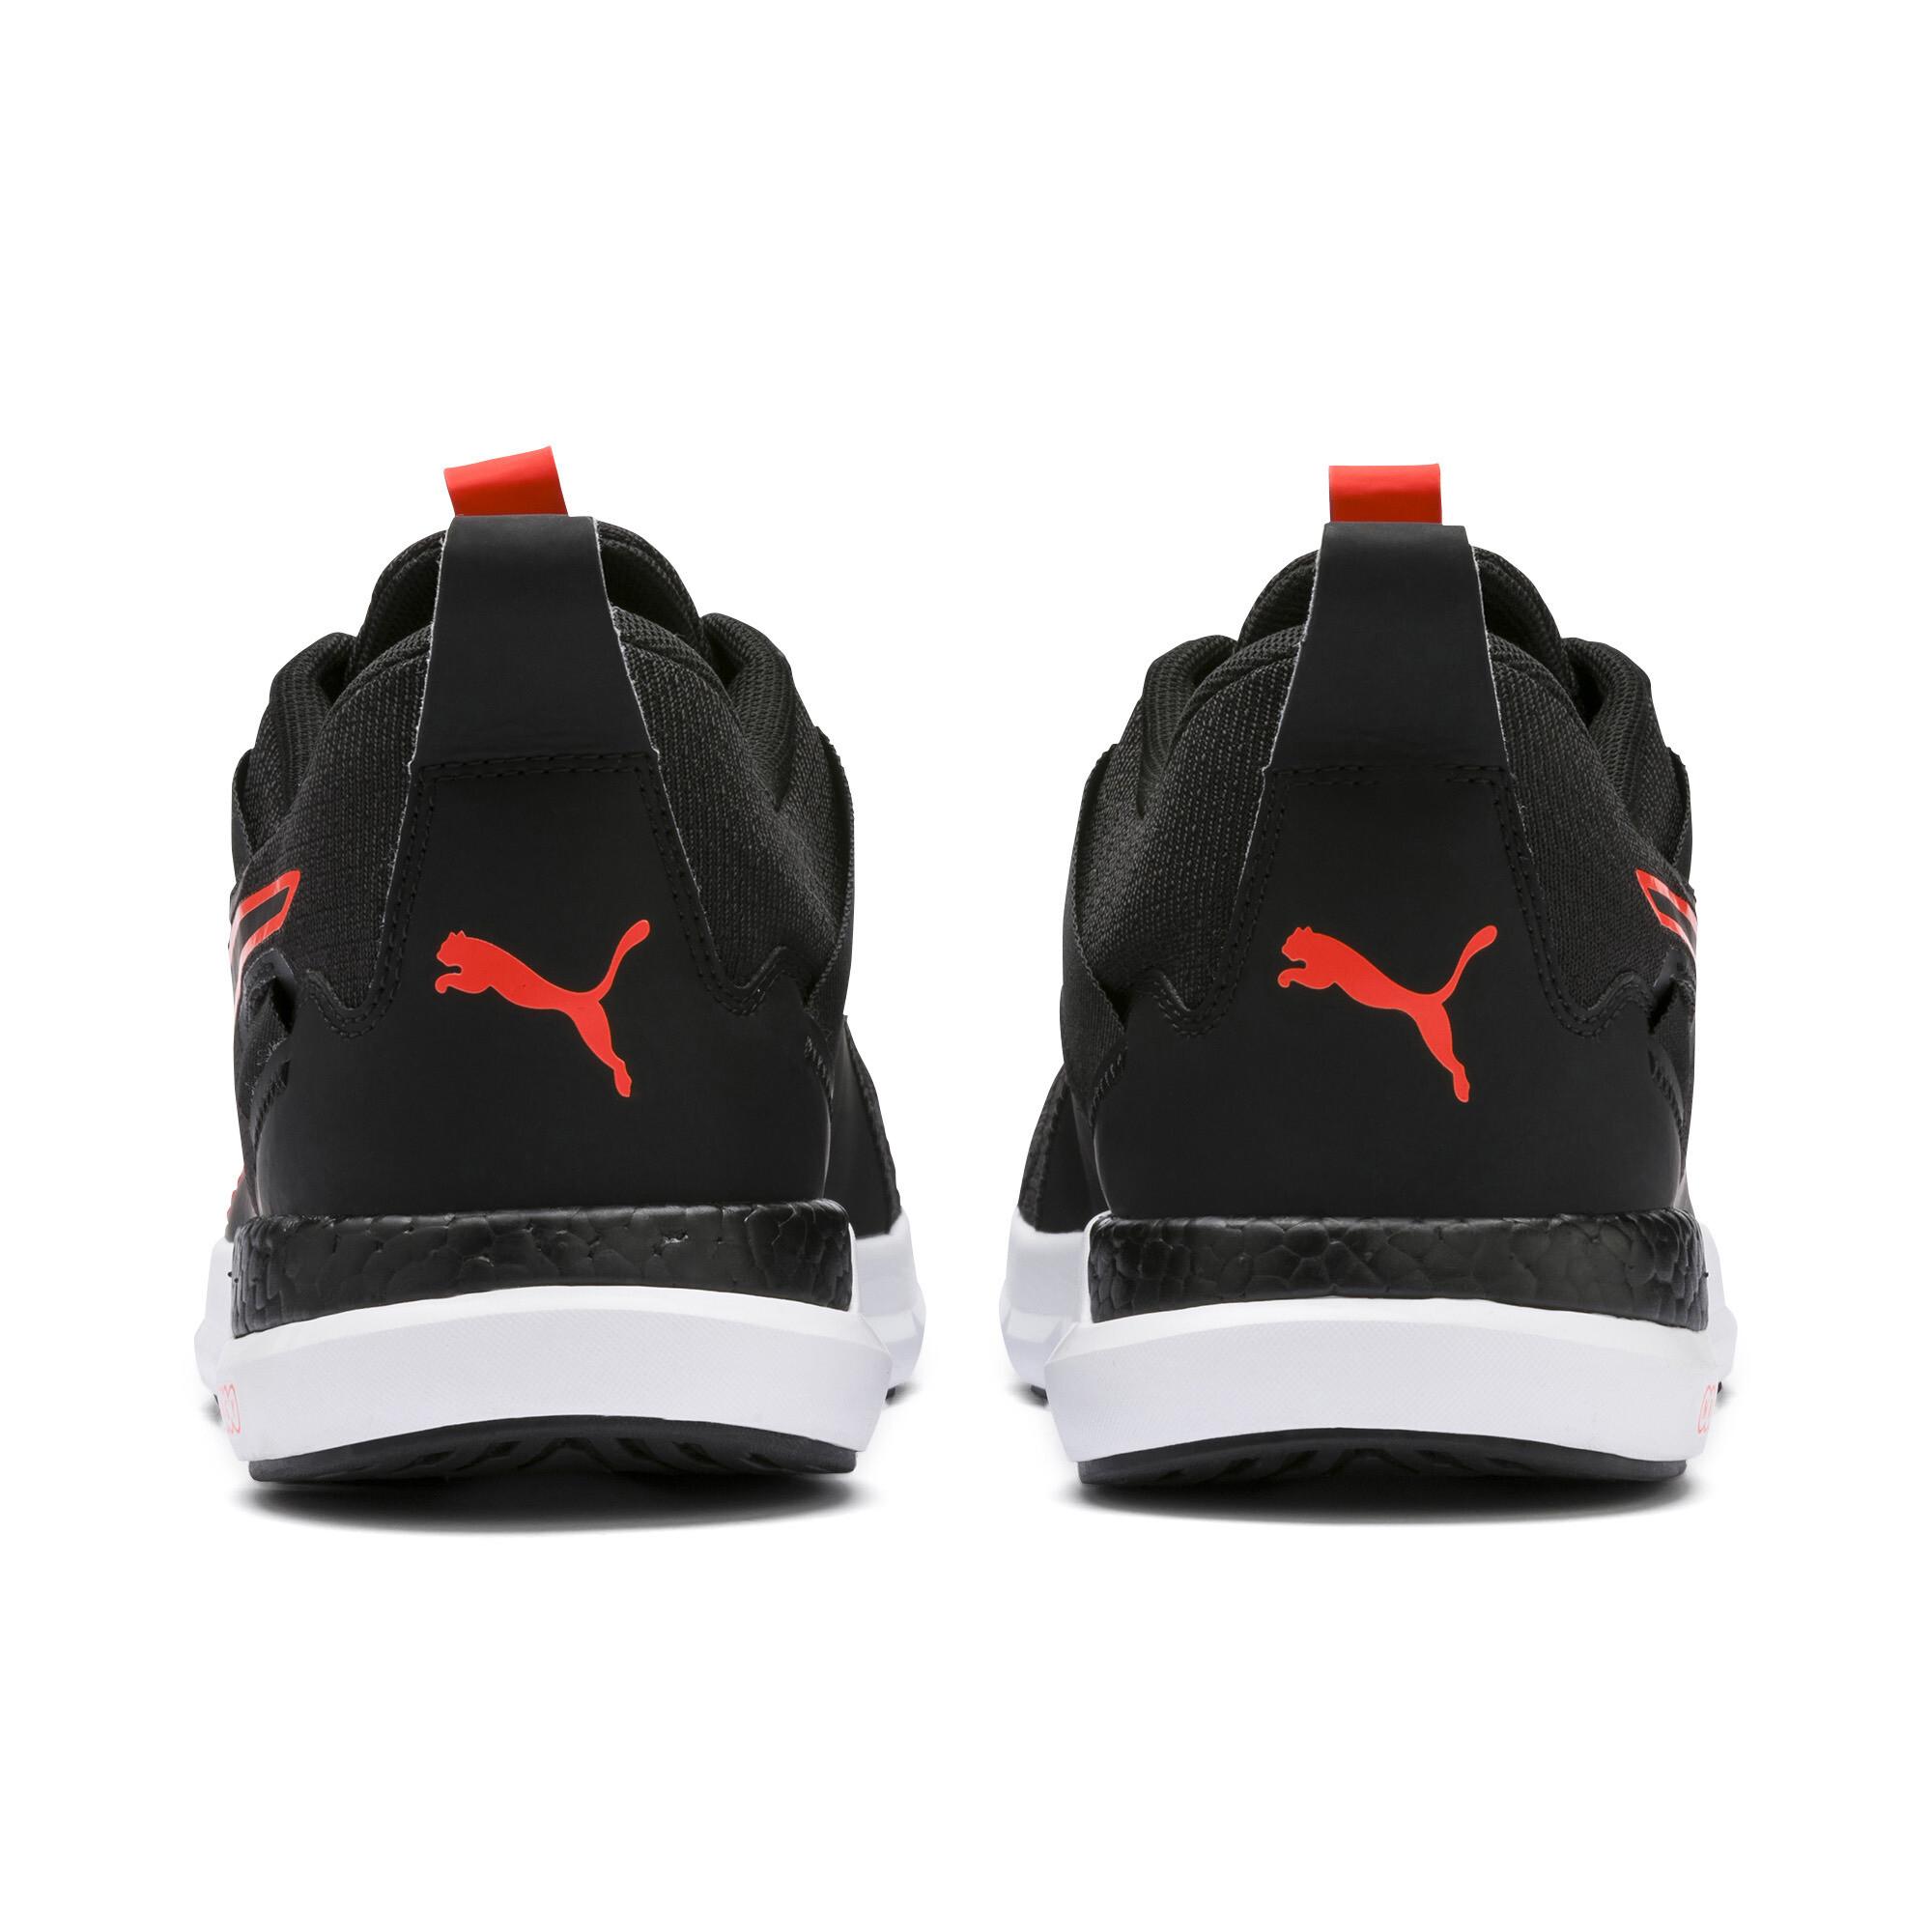 PUMA-NRGY-Dynamo-Futuro-Men-039-s-Running-Shoes-Men-Shoe-Running thumbnail 10